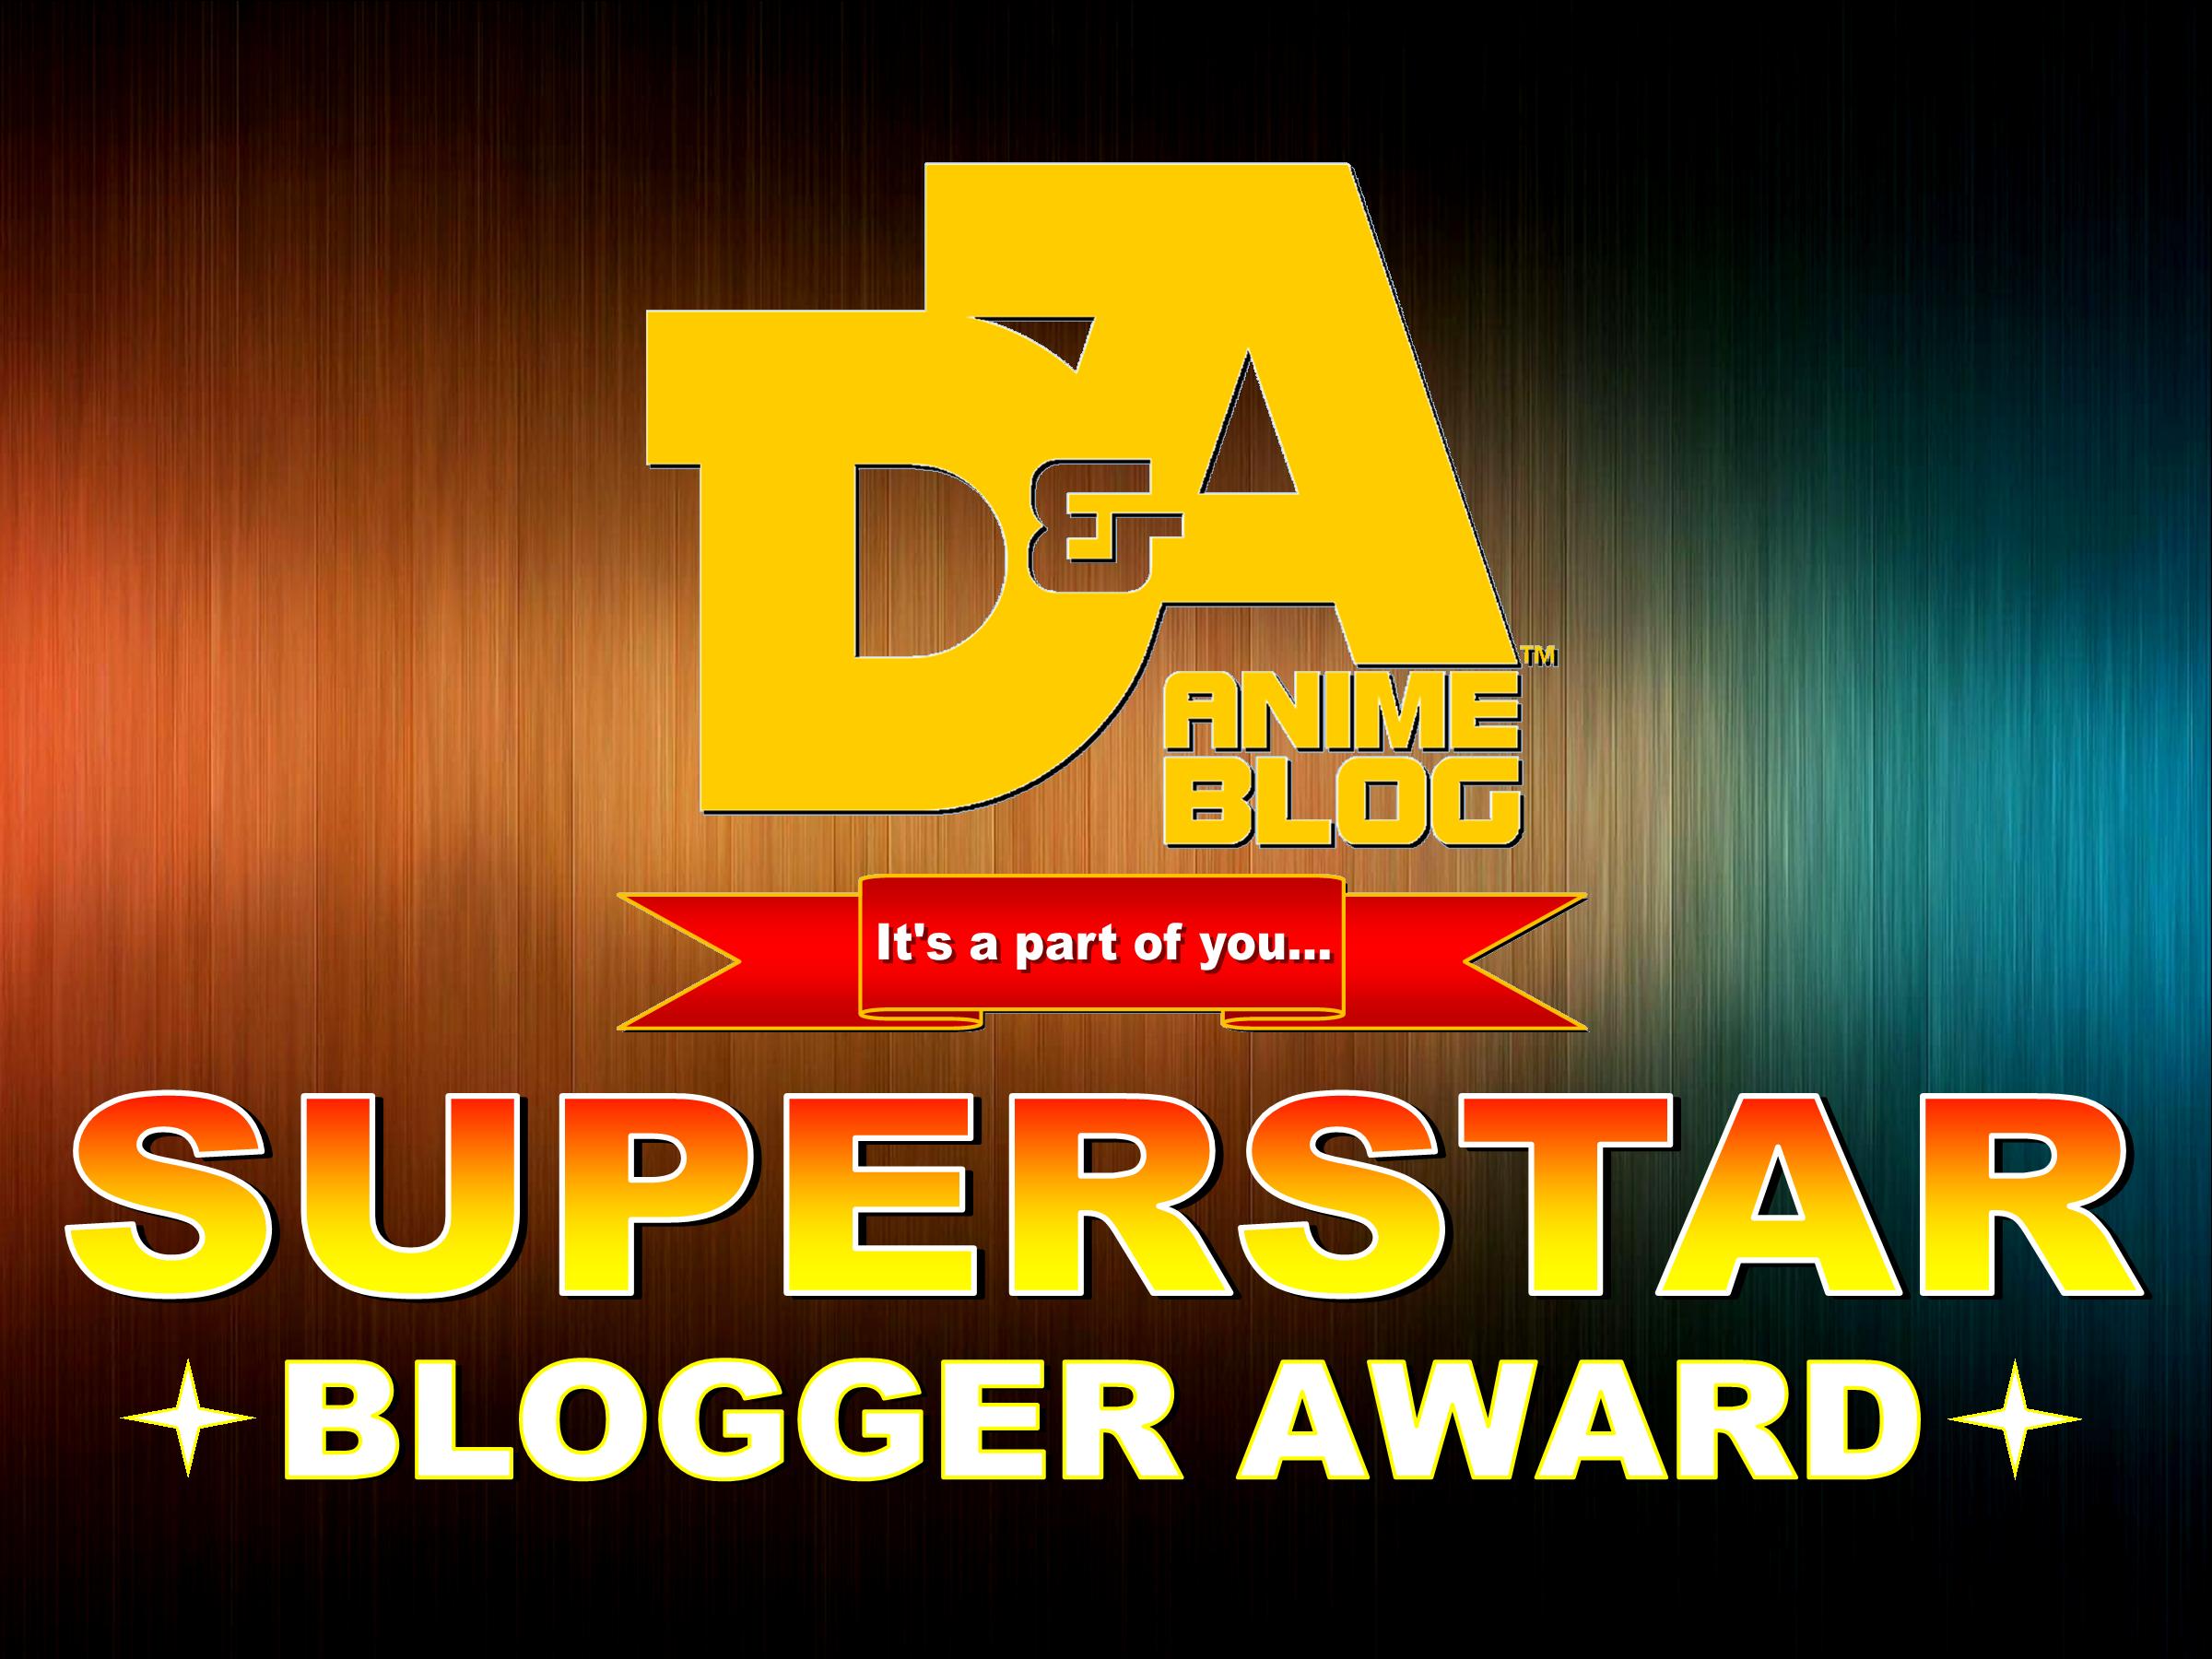 D&A Anime Blog Superstar Blogger Award